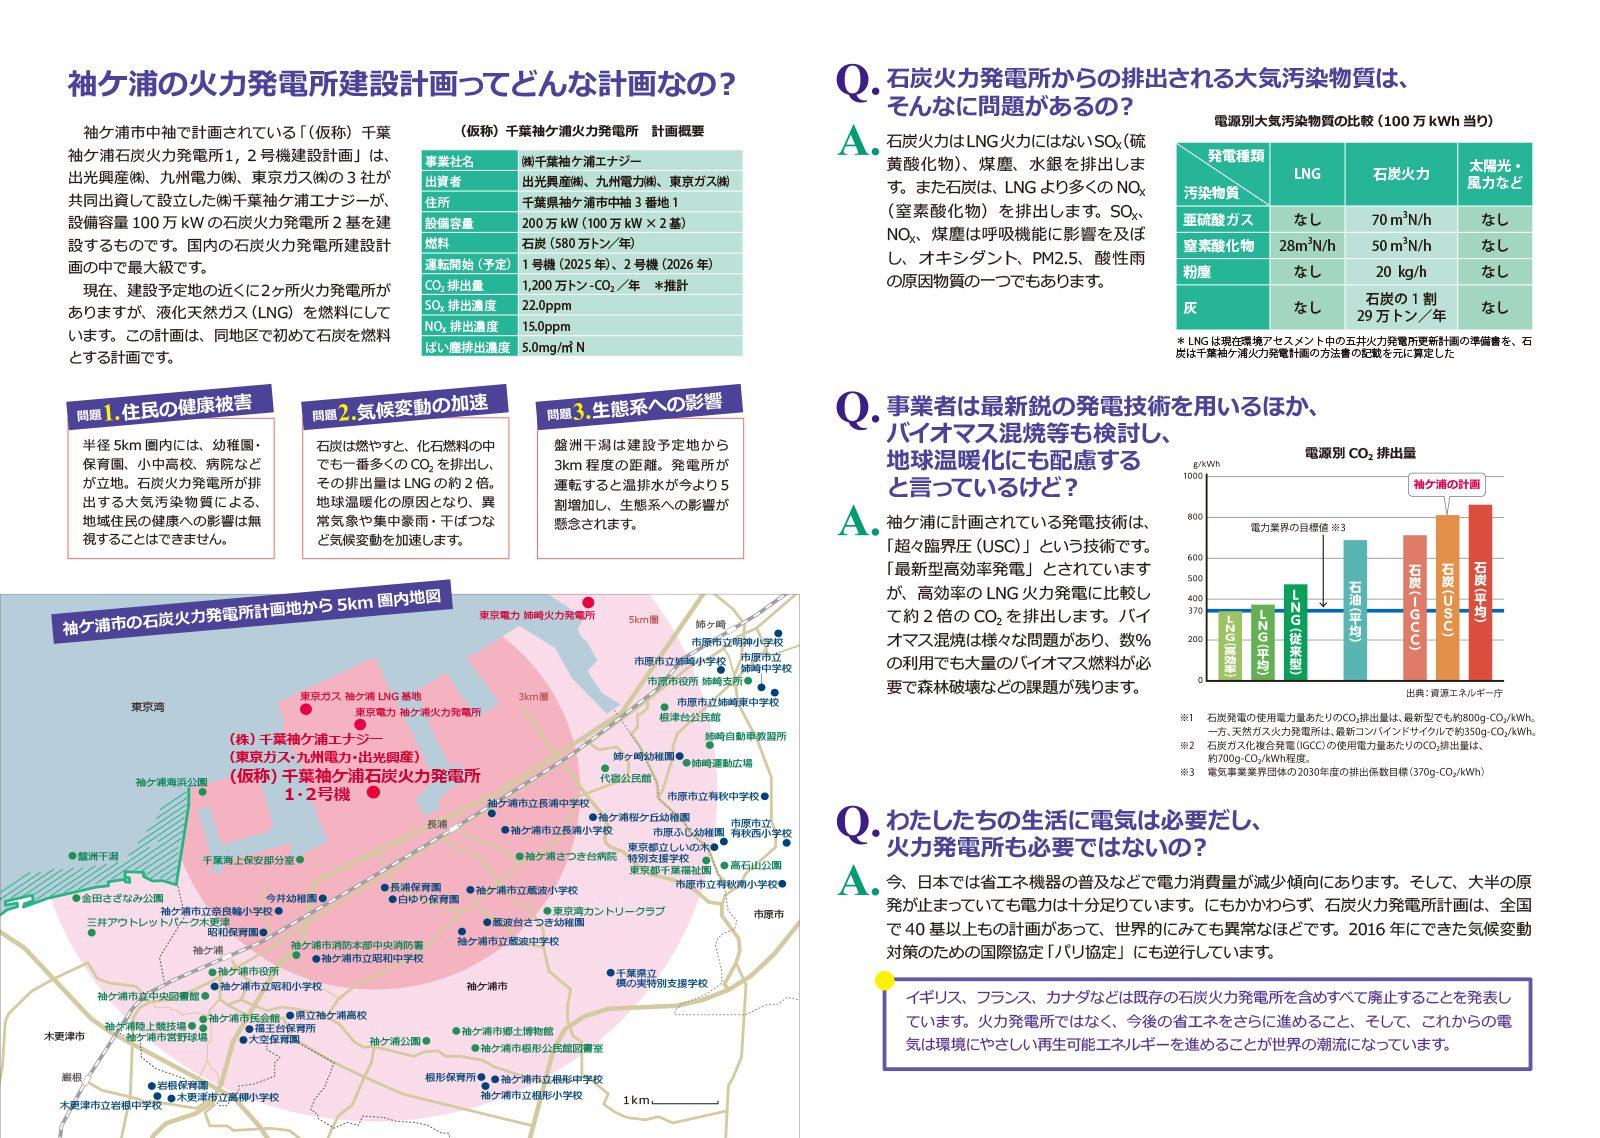 (仮称)千葉袖ケ浦石炭火力発電所1,2号機建設計画問題パンフレット